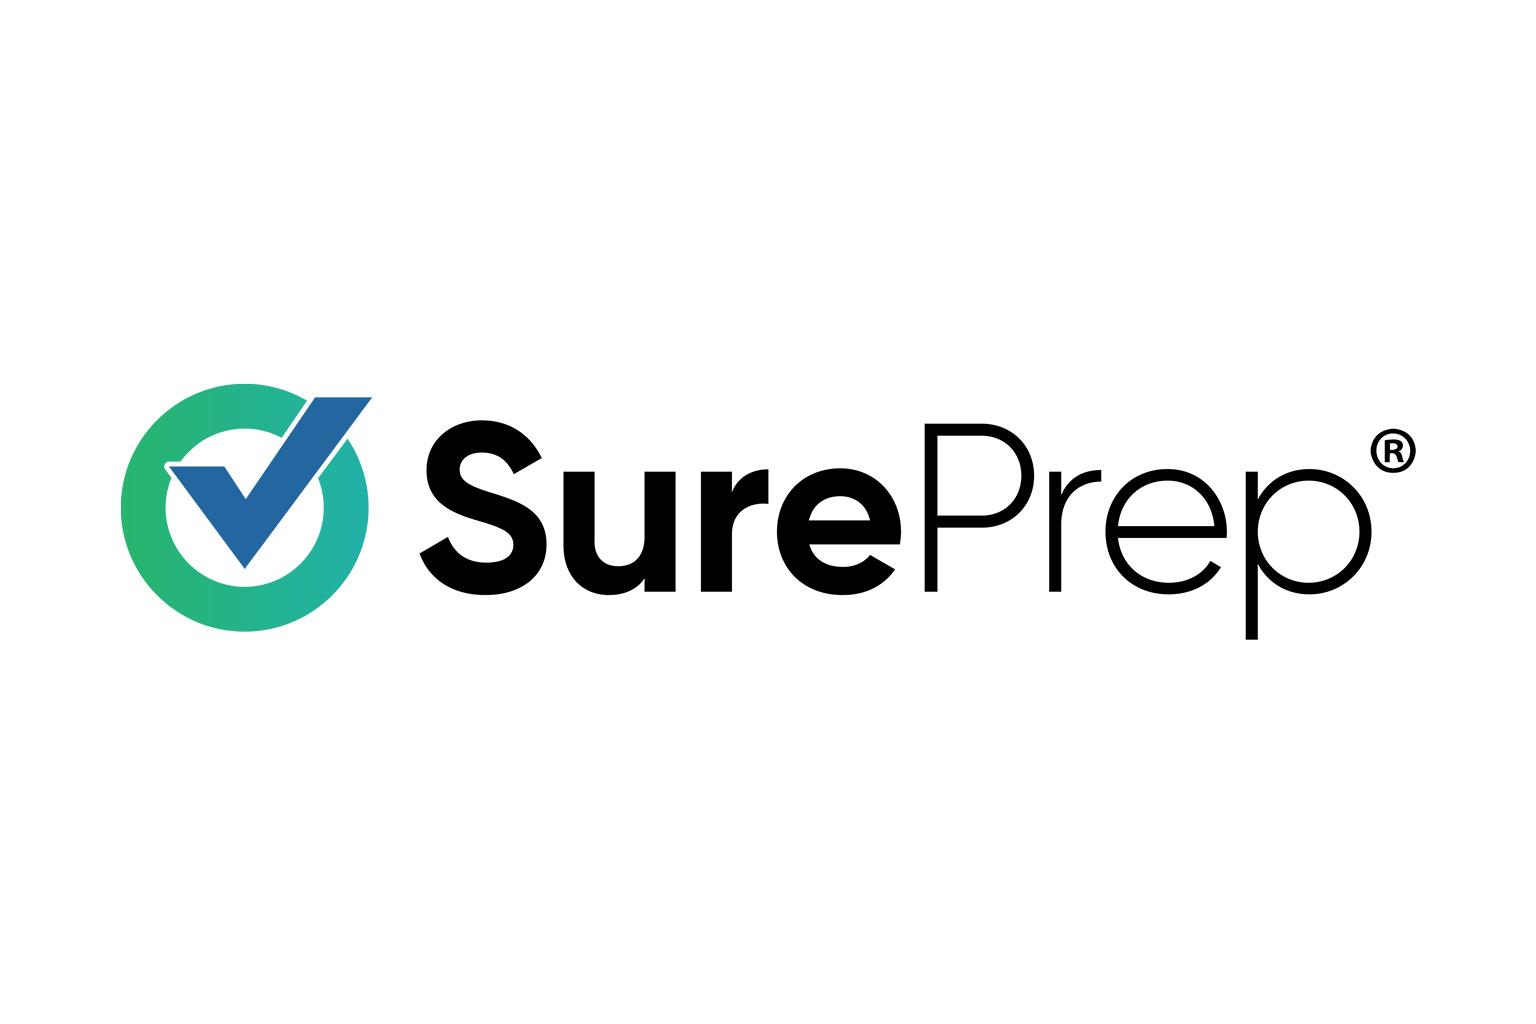 SurePrep logo